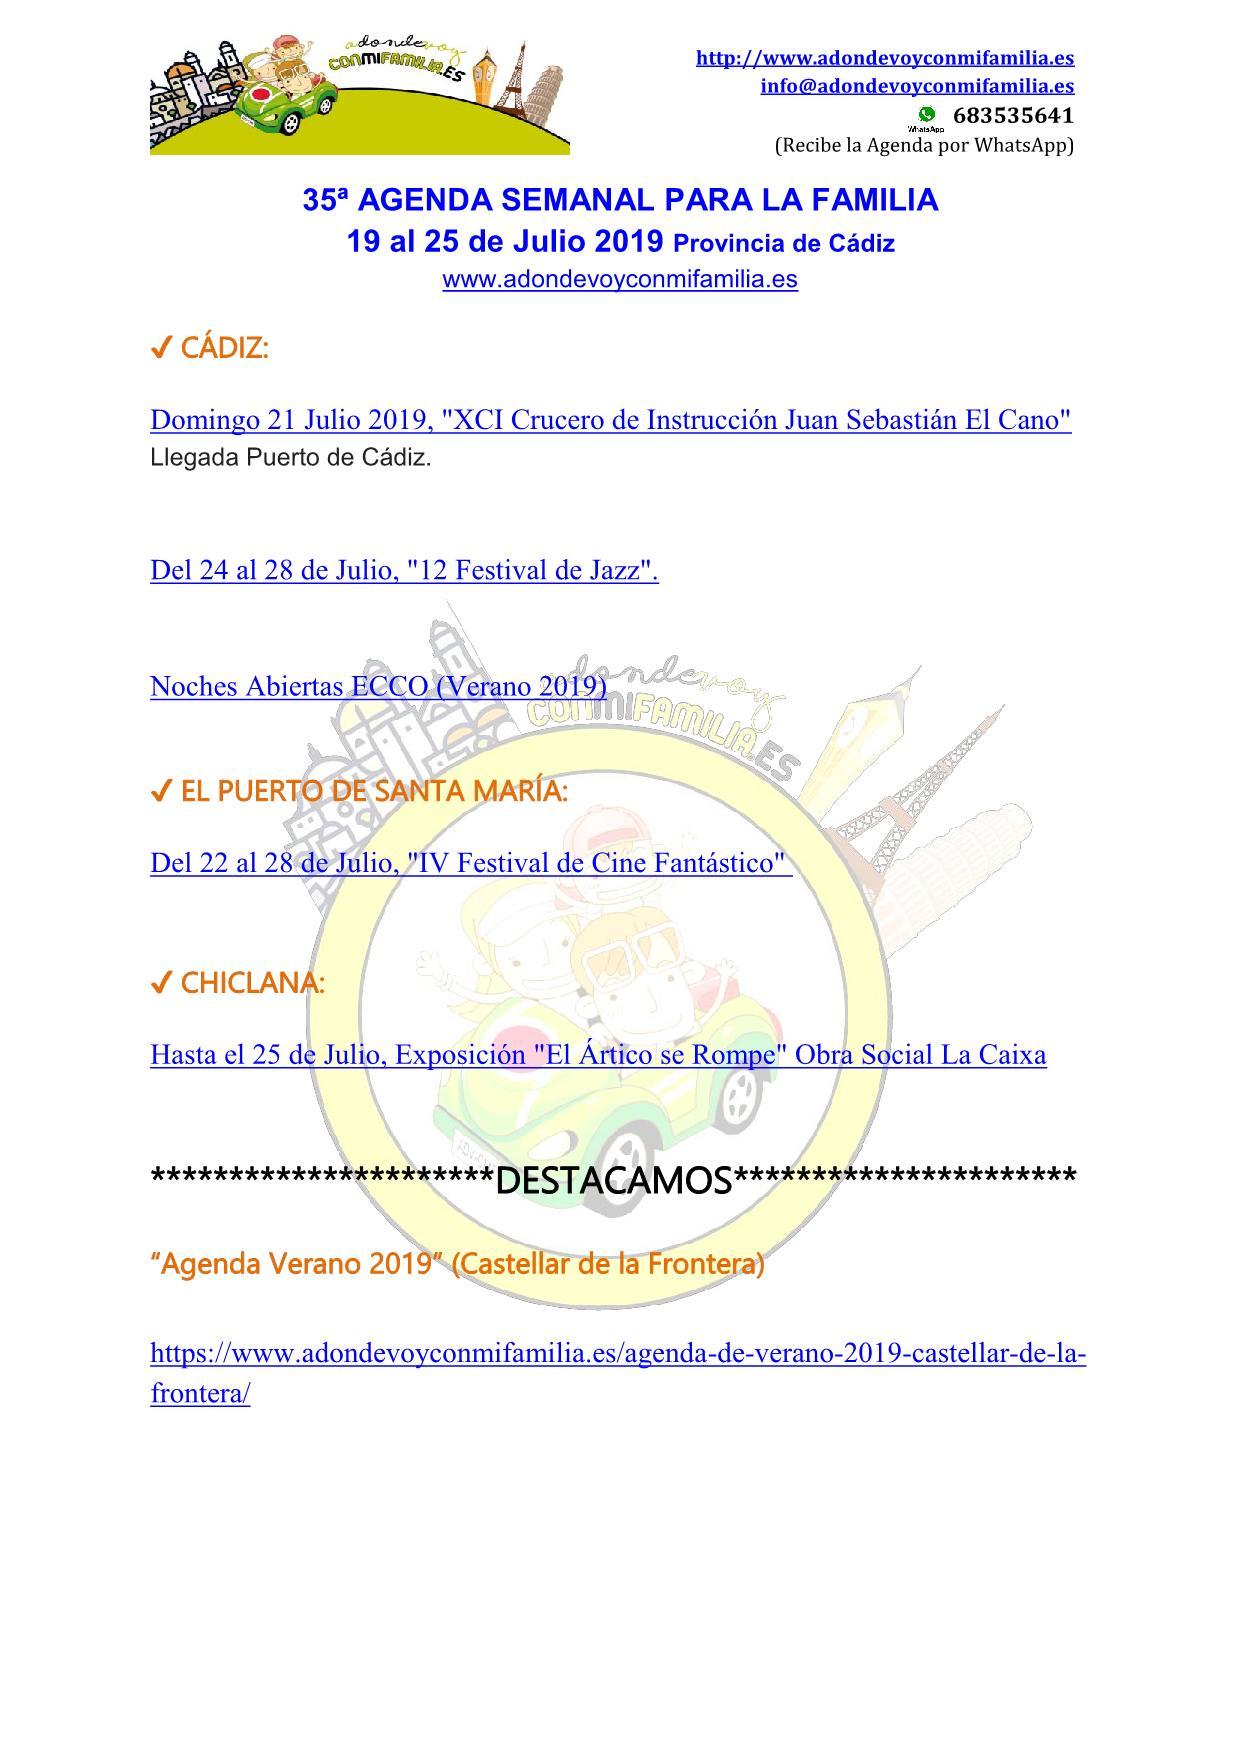 035 Agenda semanal familiar 19 al 25 Julio 2019